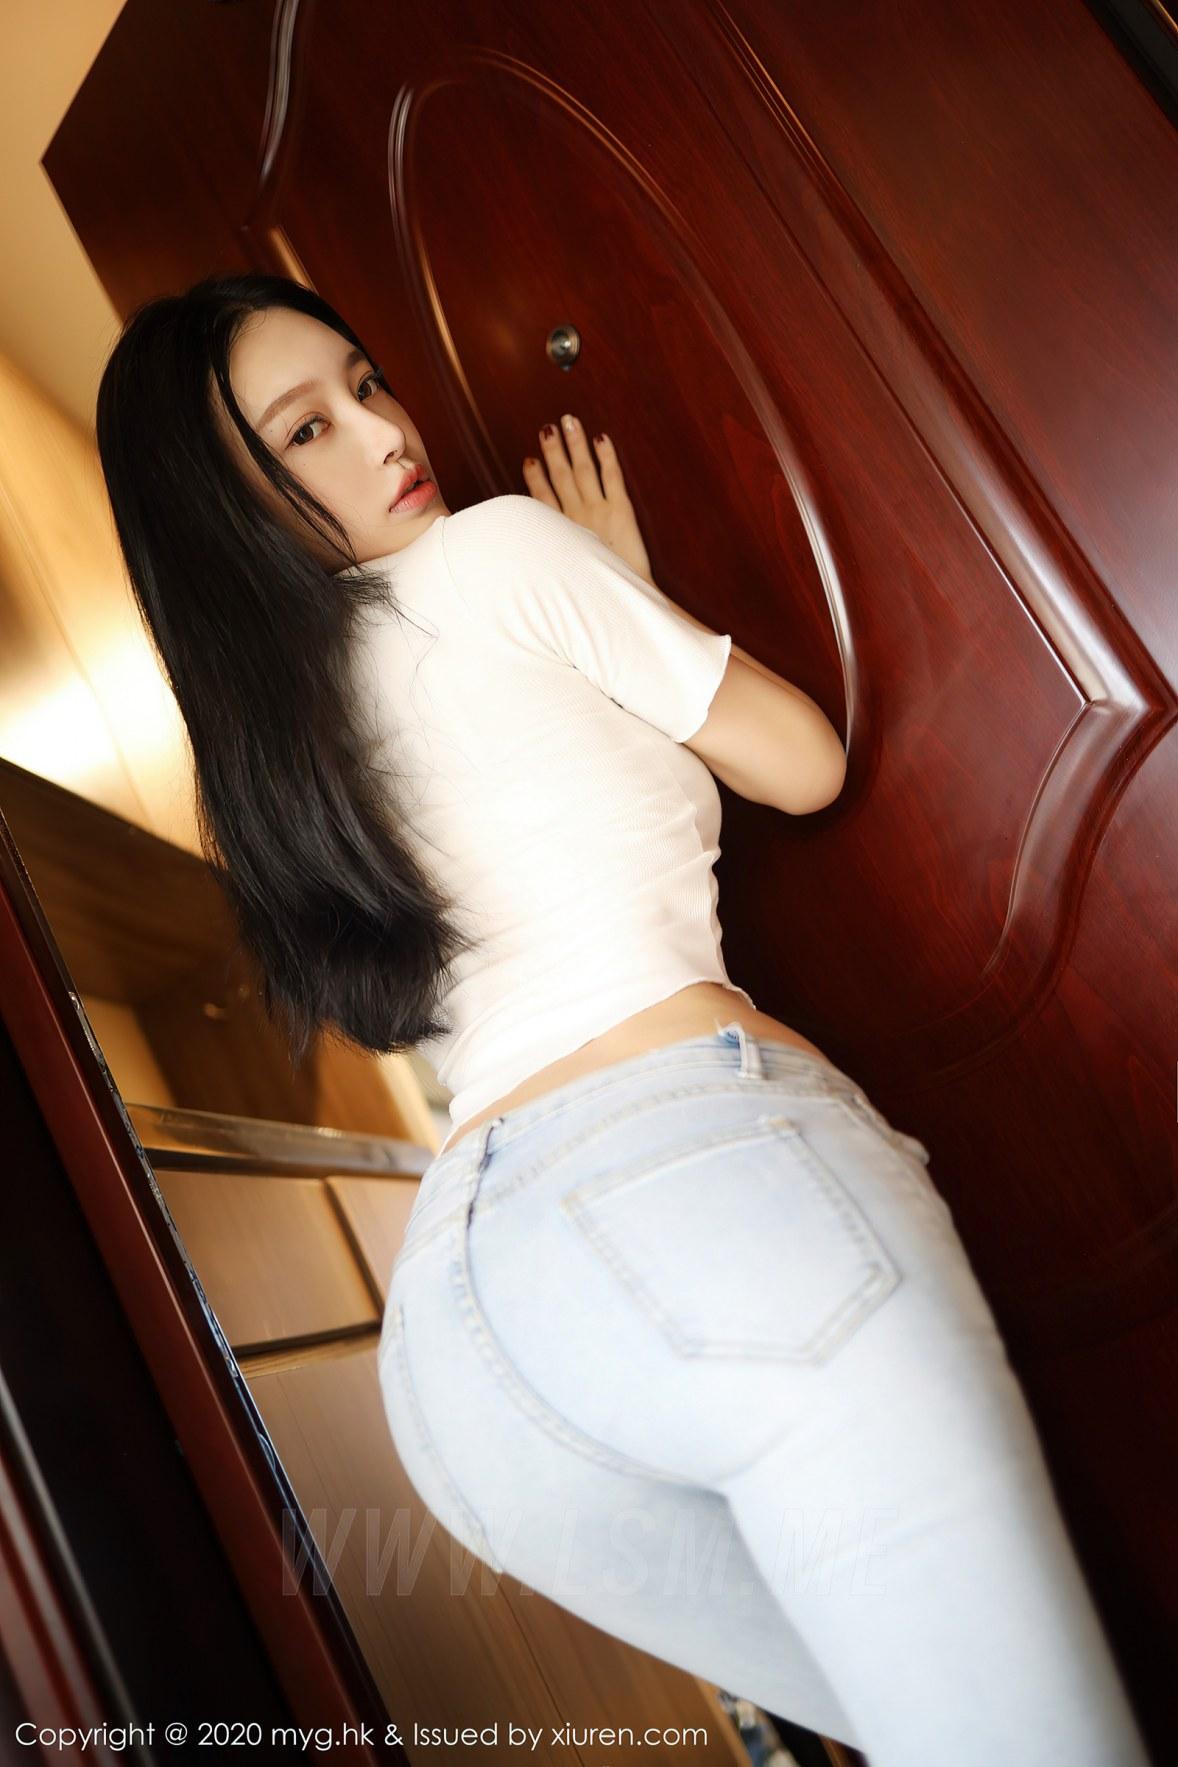 MyGirl 美媛馆 Vol.459 紧身牛仔裤 唐琪儿 - 3